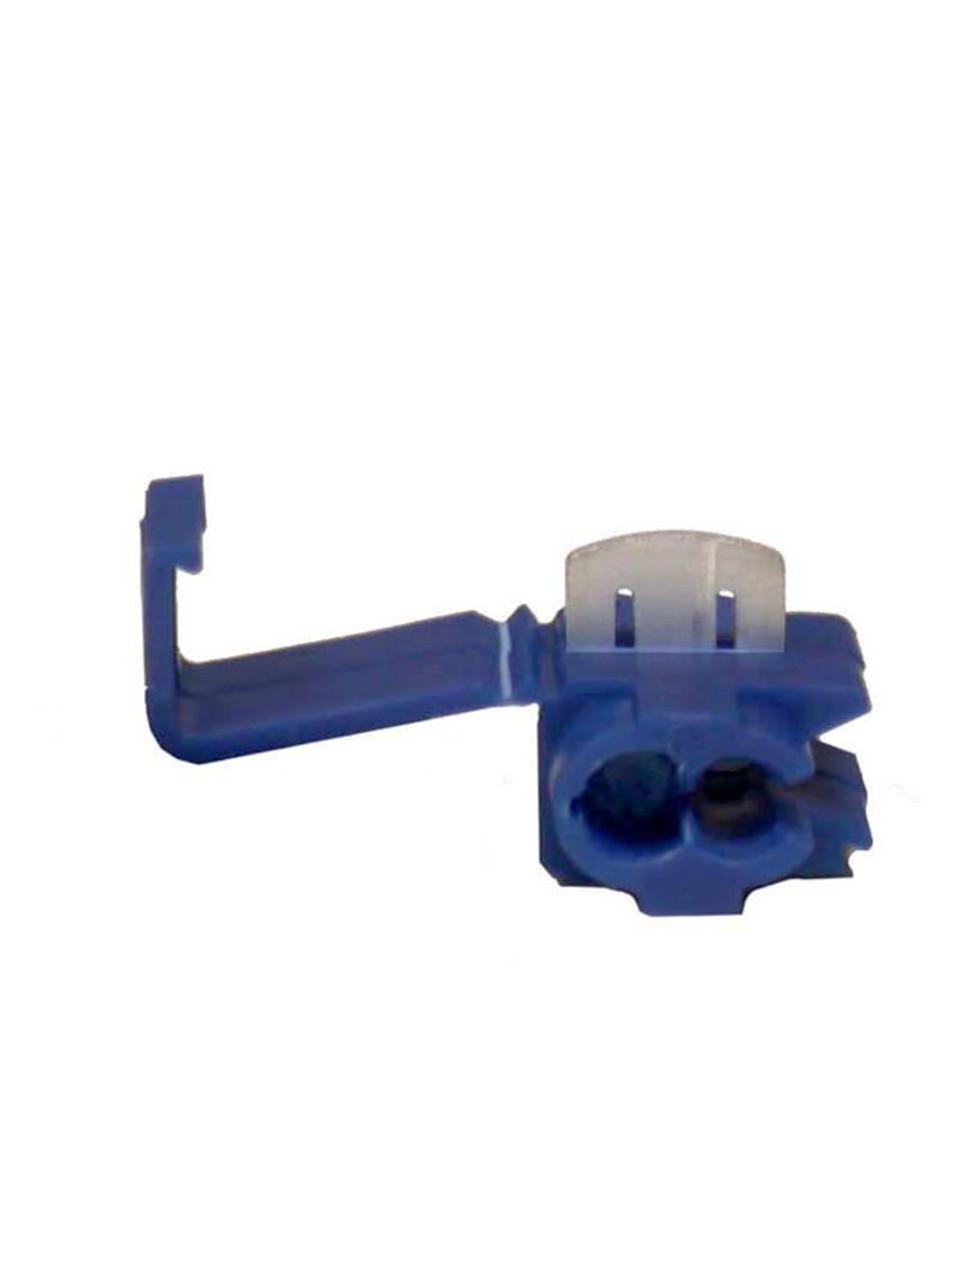 560 --- Blue Scotchlok™, Fits 18 to 14 Gauge - Close Port